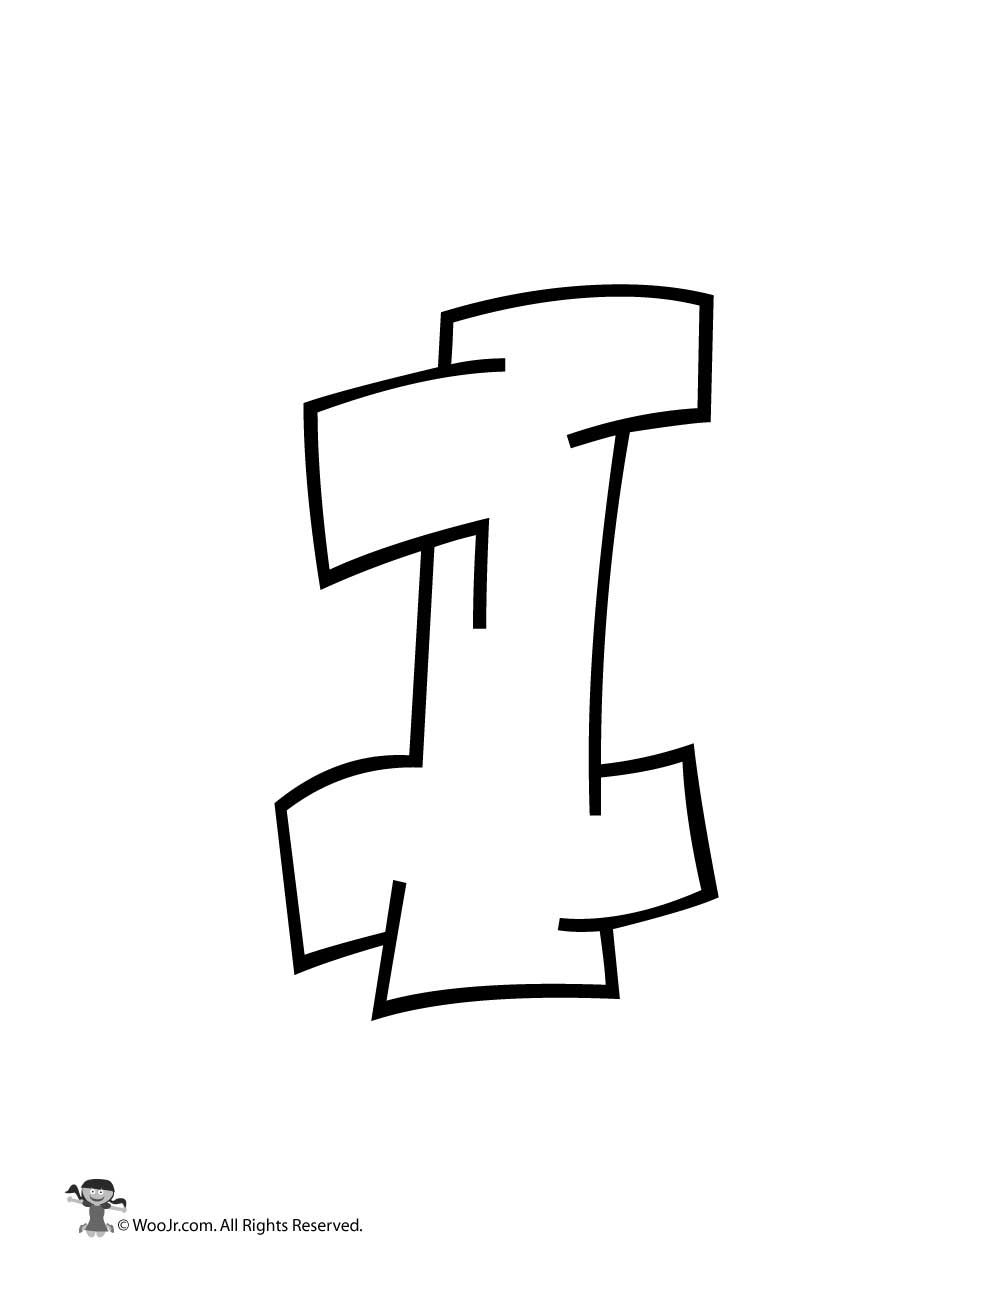 Graffiti Capital Letter I In 2020 Graffiti Lettering Fonts